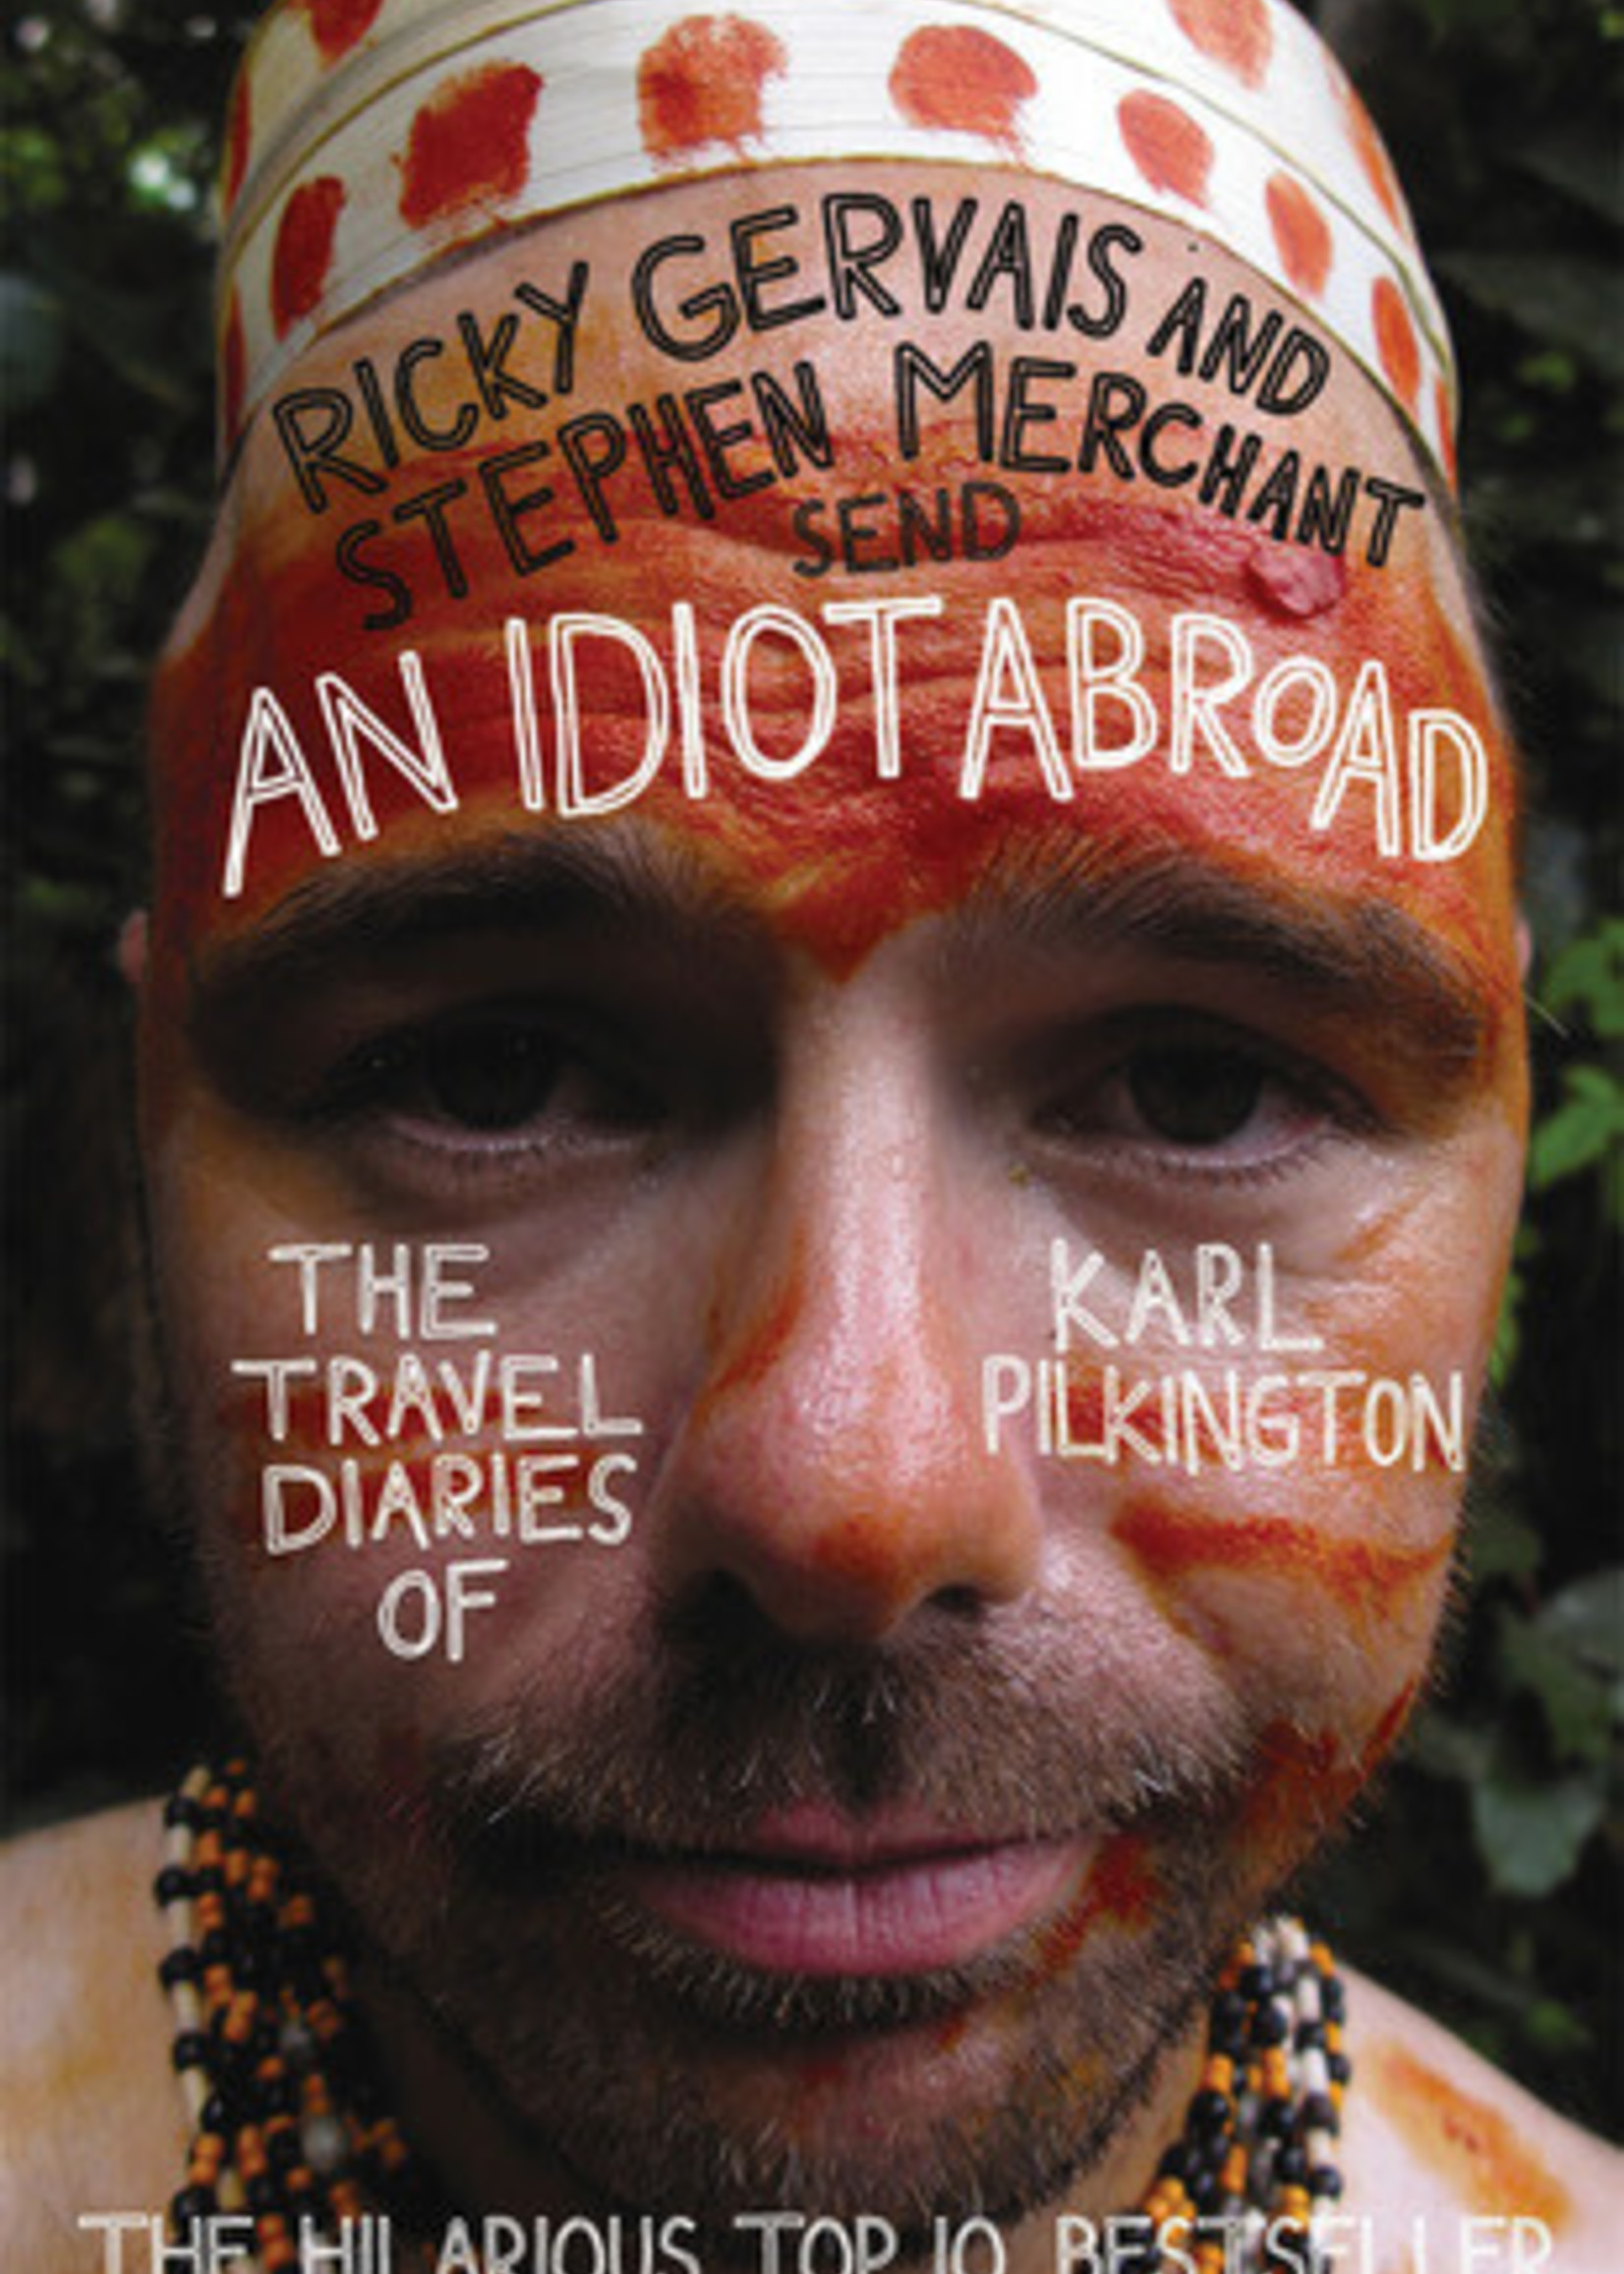 An Idiot Abroad: The Travel Diaries of Karl Pilkington by Karl Pilkington,  Ricky Gervais,  Stephen Merchant